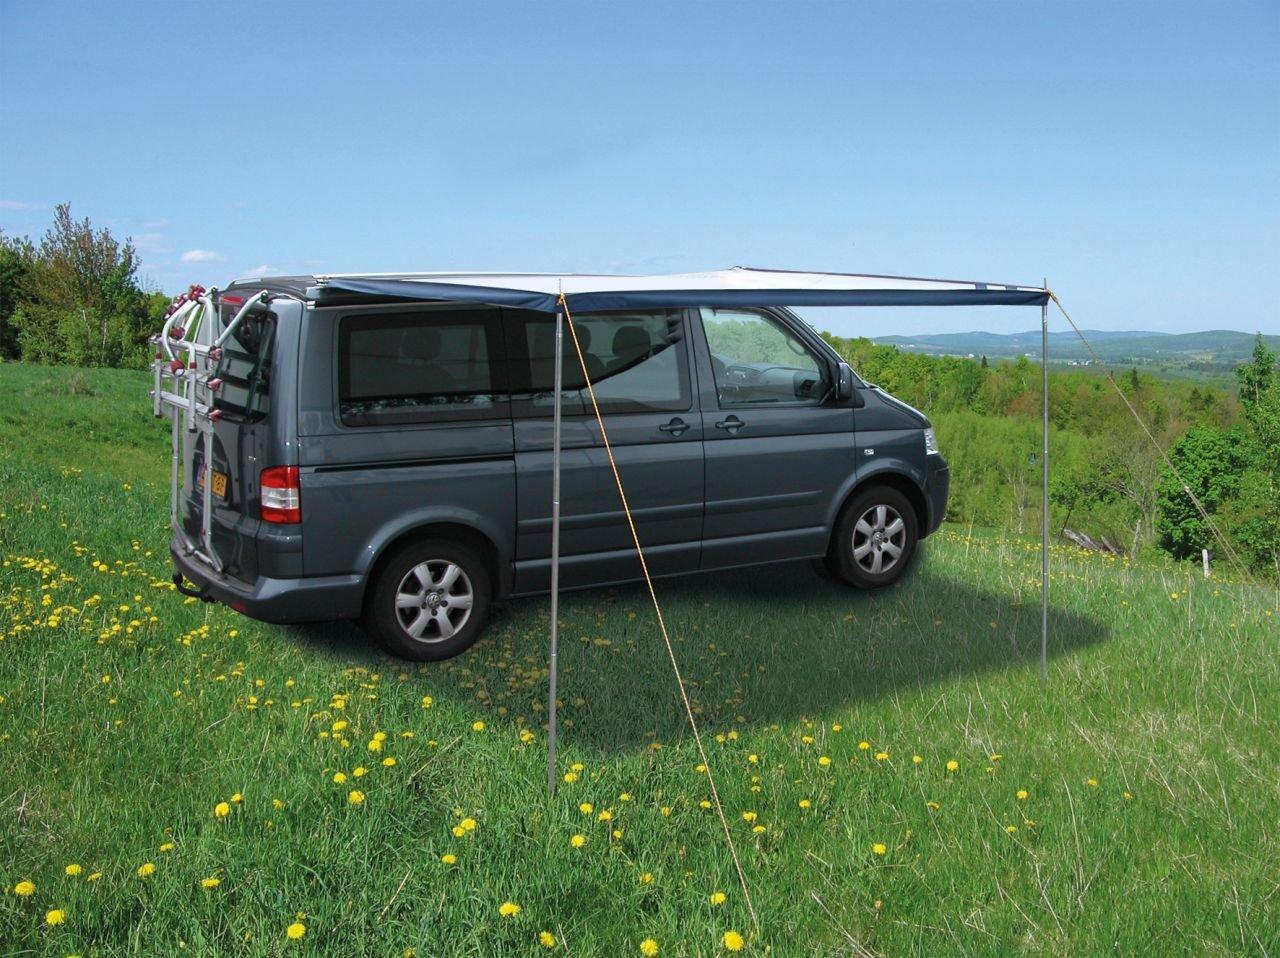 Eurotrail Caravan Camper Bus Awning Fjord Sun Canopy 260x240cm 1